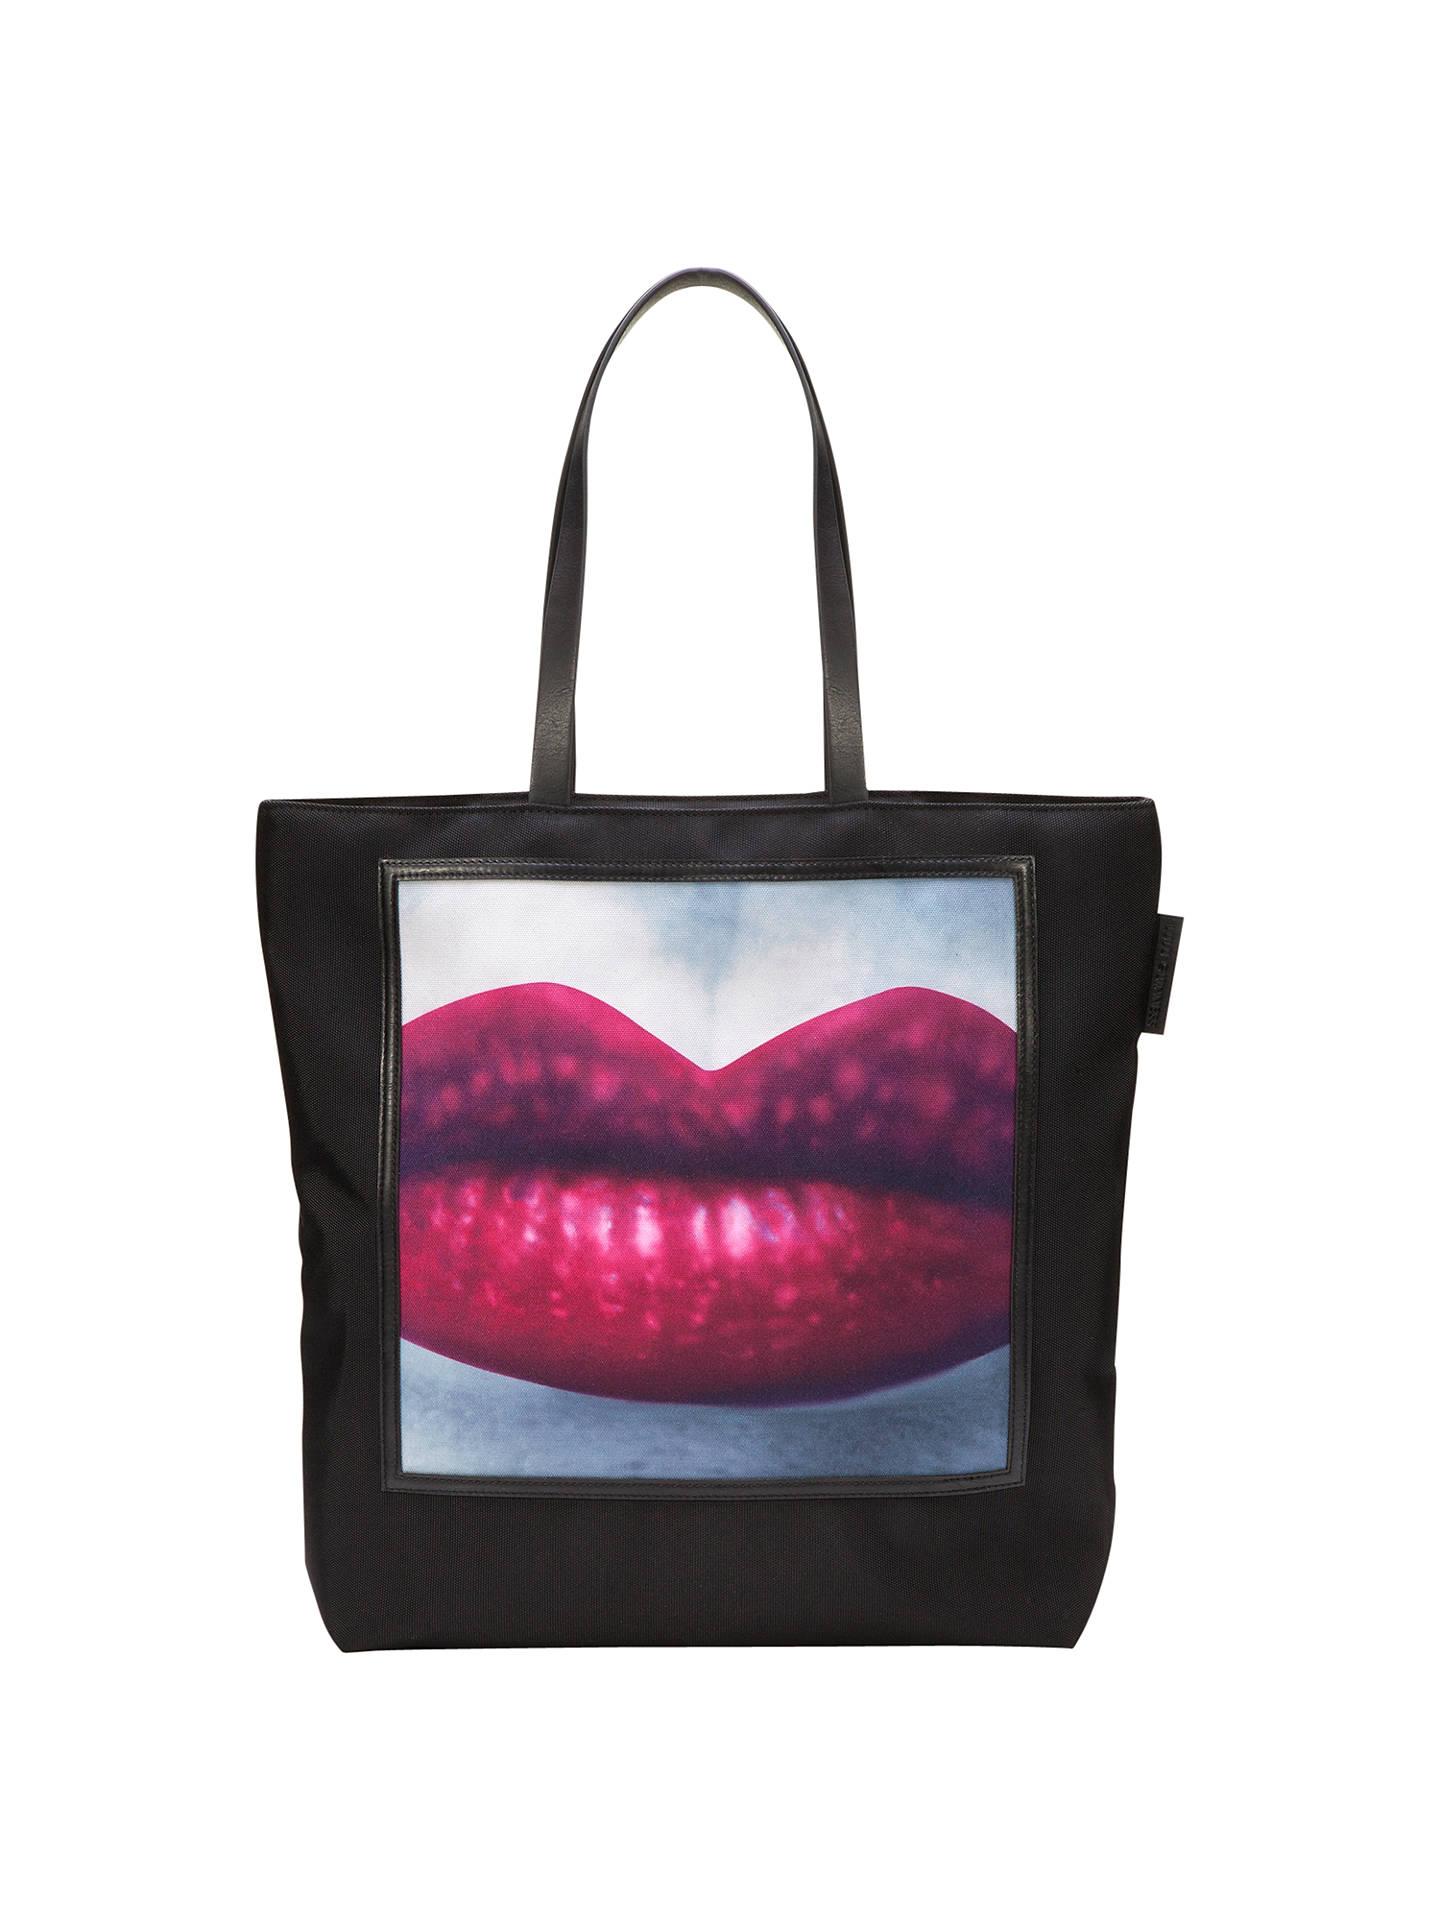 Lulu Guinness Lucy Medium Lipstick Tote Bag at John Lewis   Partners f3aba35137e35